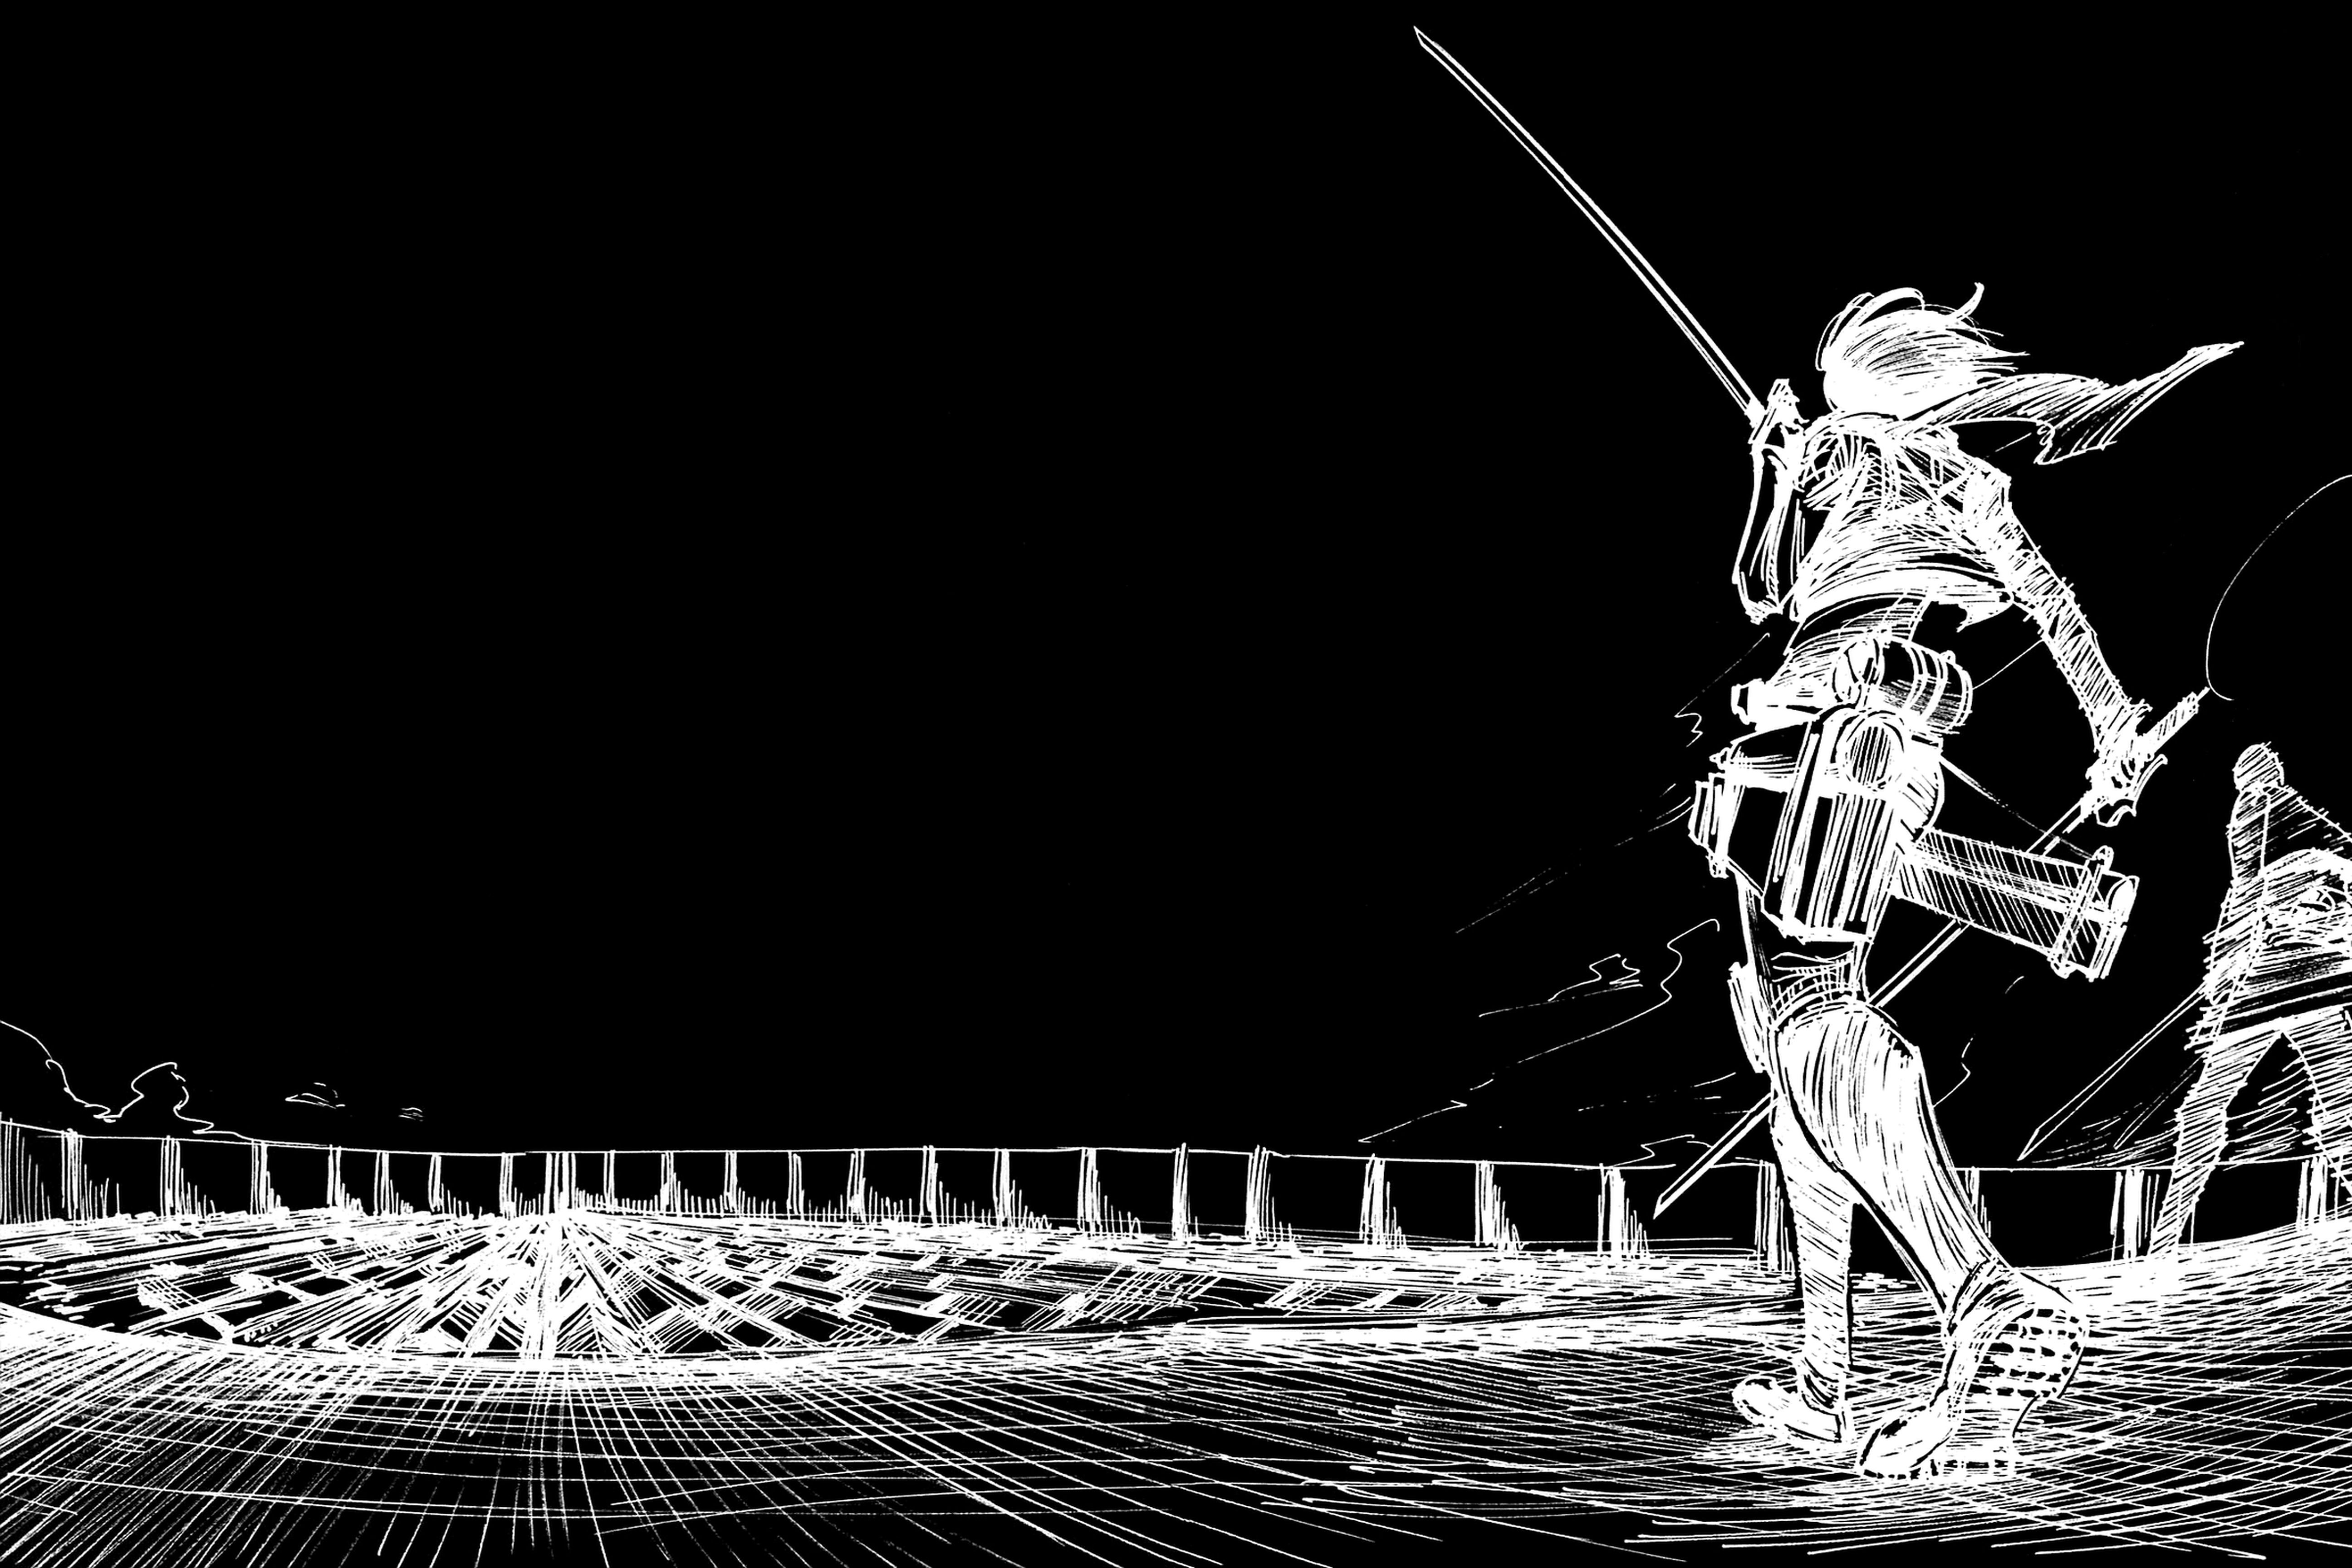 Shingeki No Kyojin Attack On Titan Wallpaper By Grafitup On Deviantart